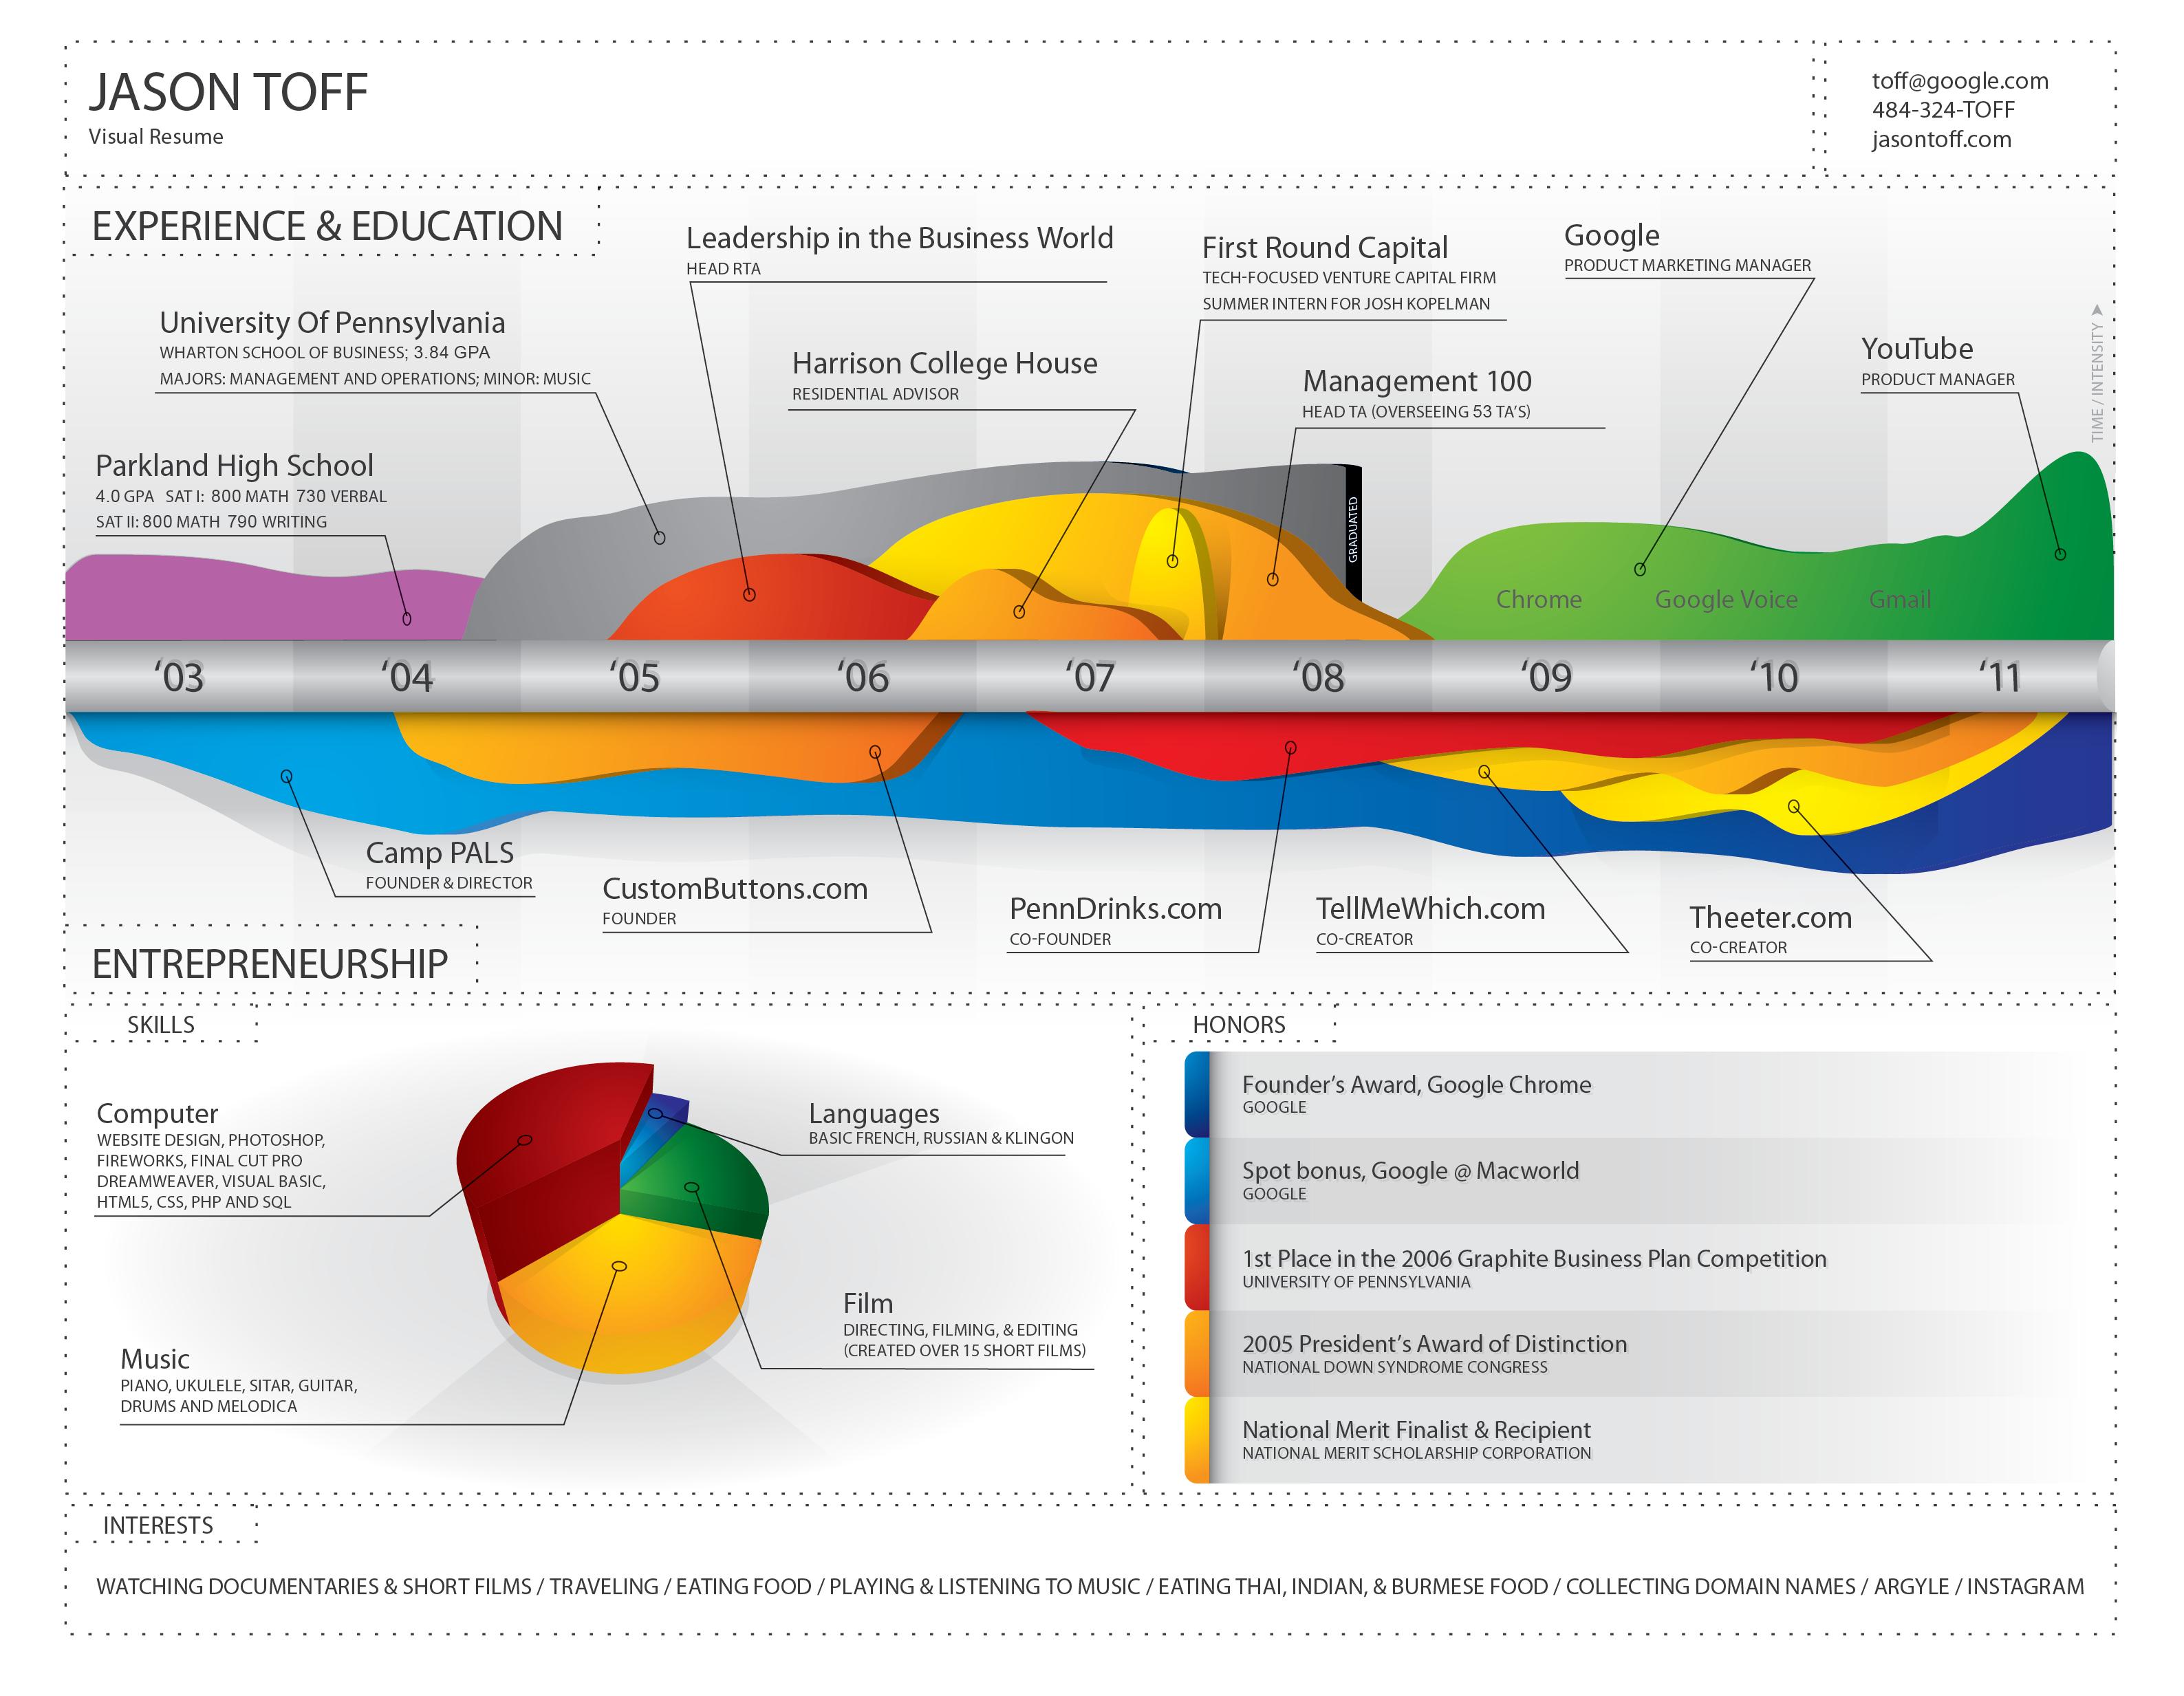 jason toff  infographic  visualcv  resume